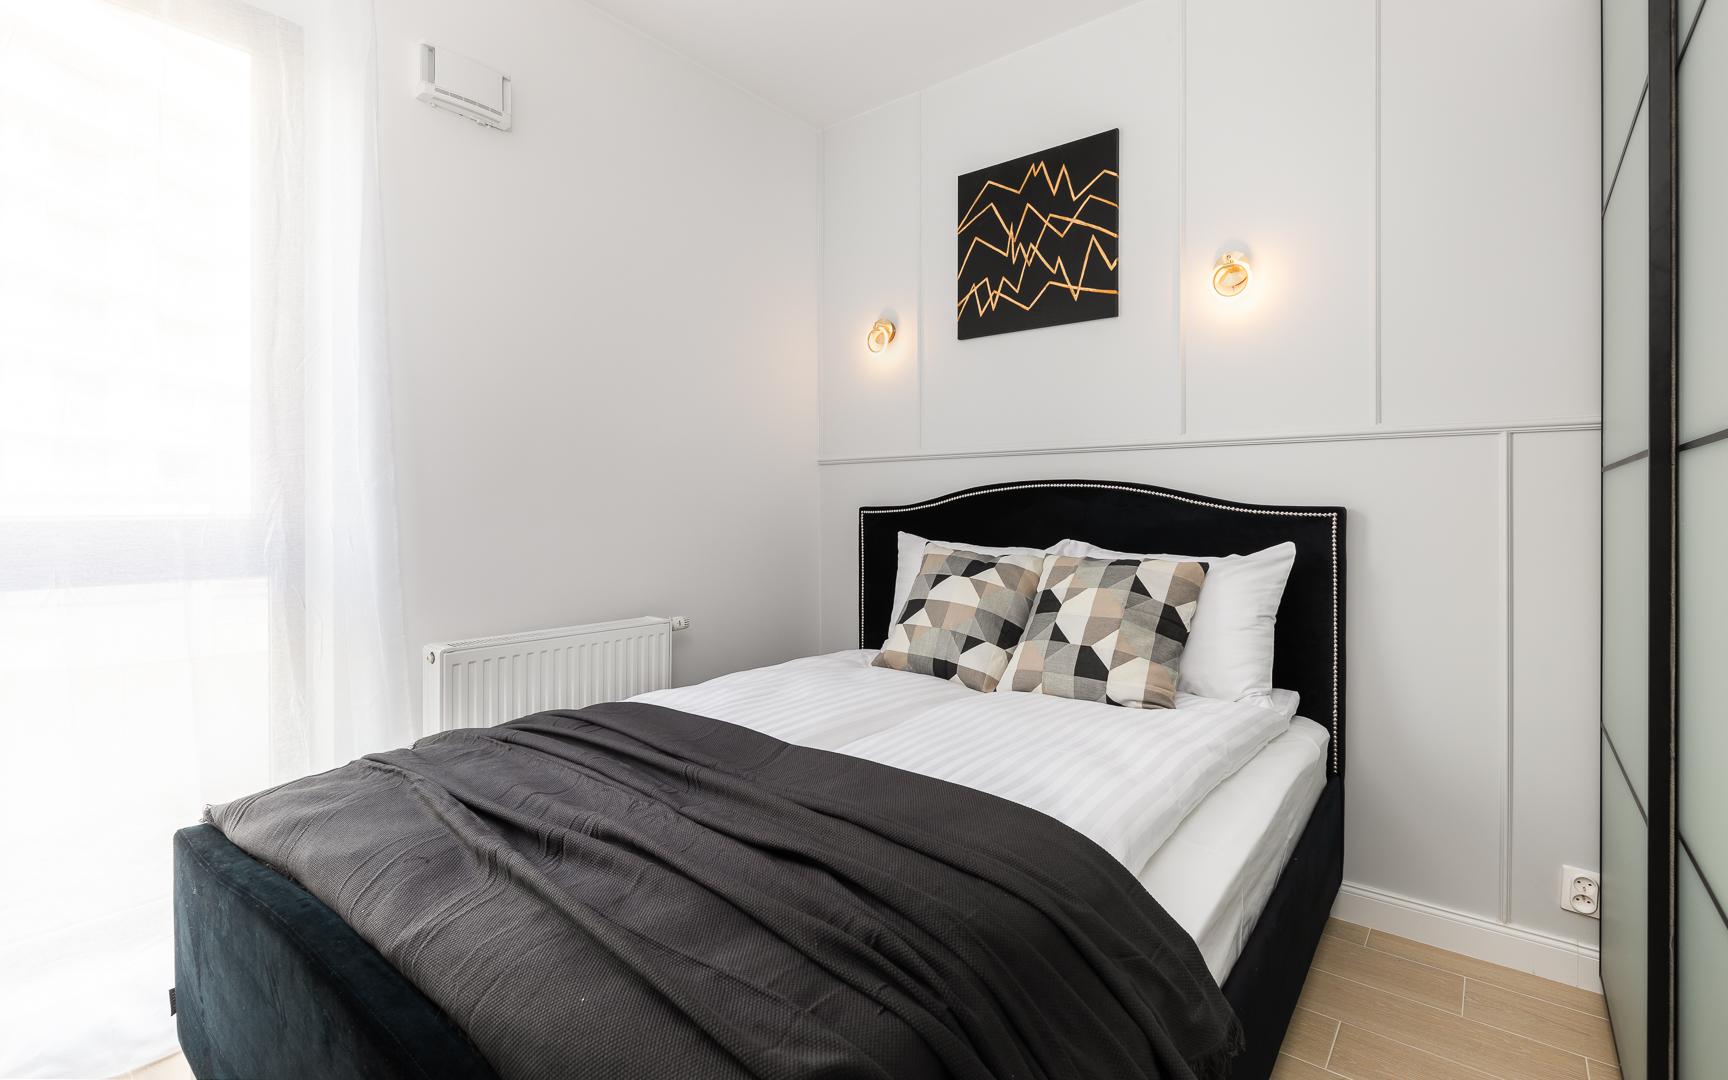 Bedroom at Burakowska Apartments